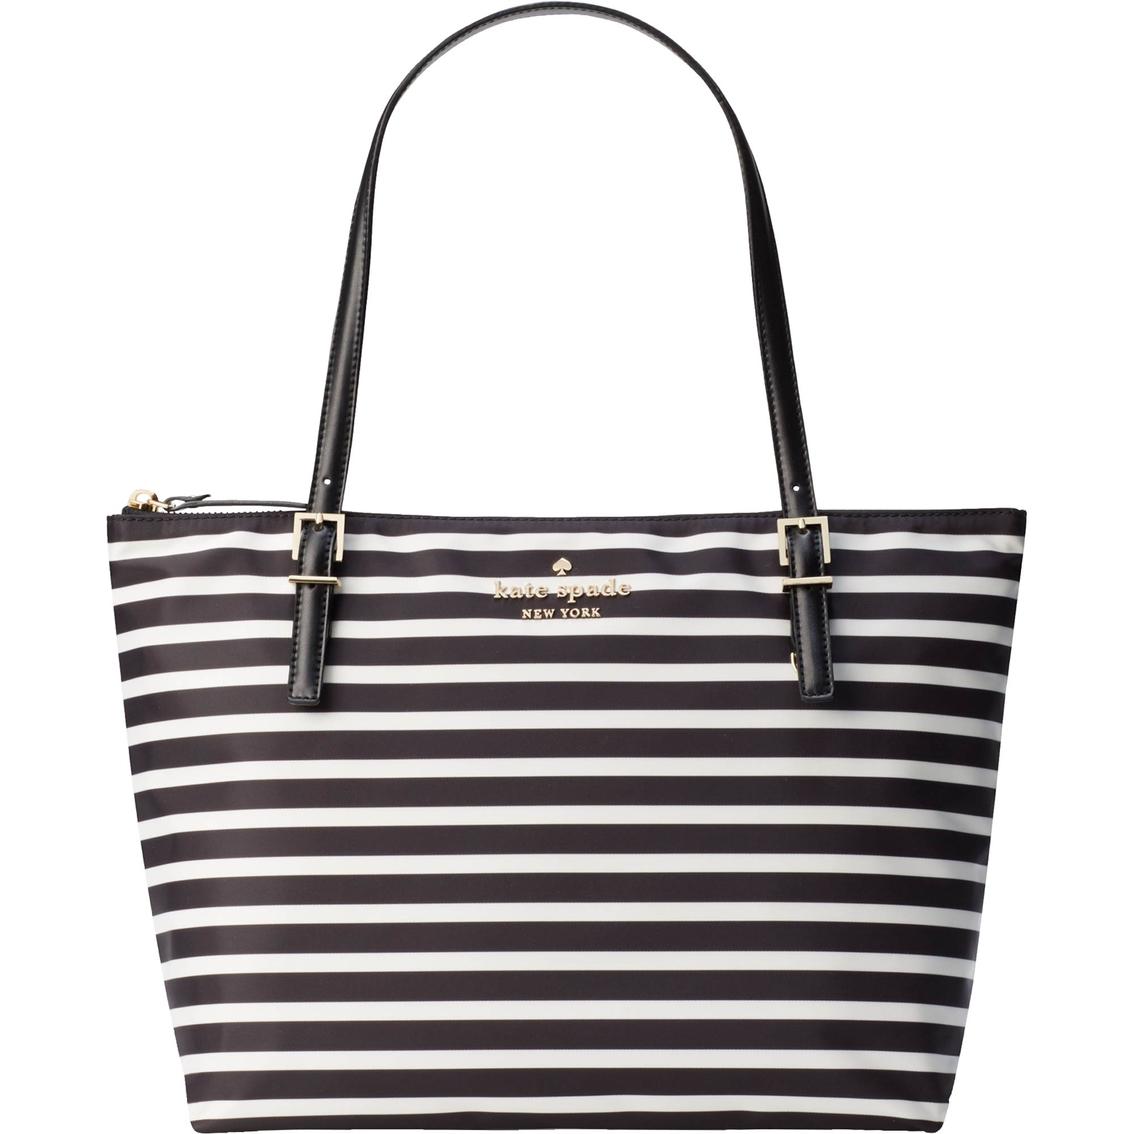 c1c6cbd15 Kate Spade New York Watson Lane Small Maya Handbag | Totes ...